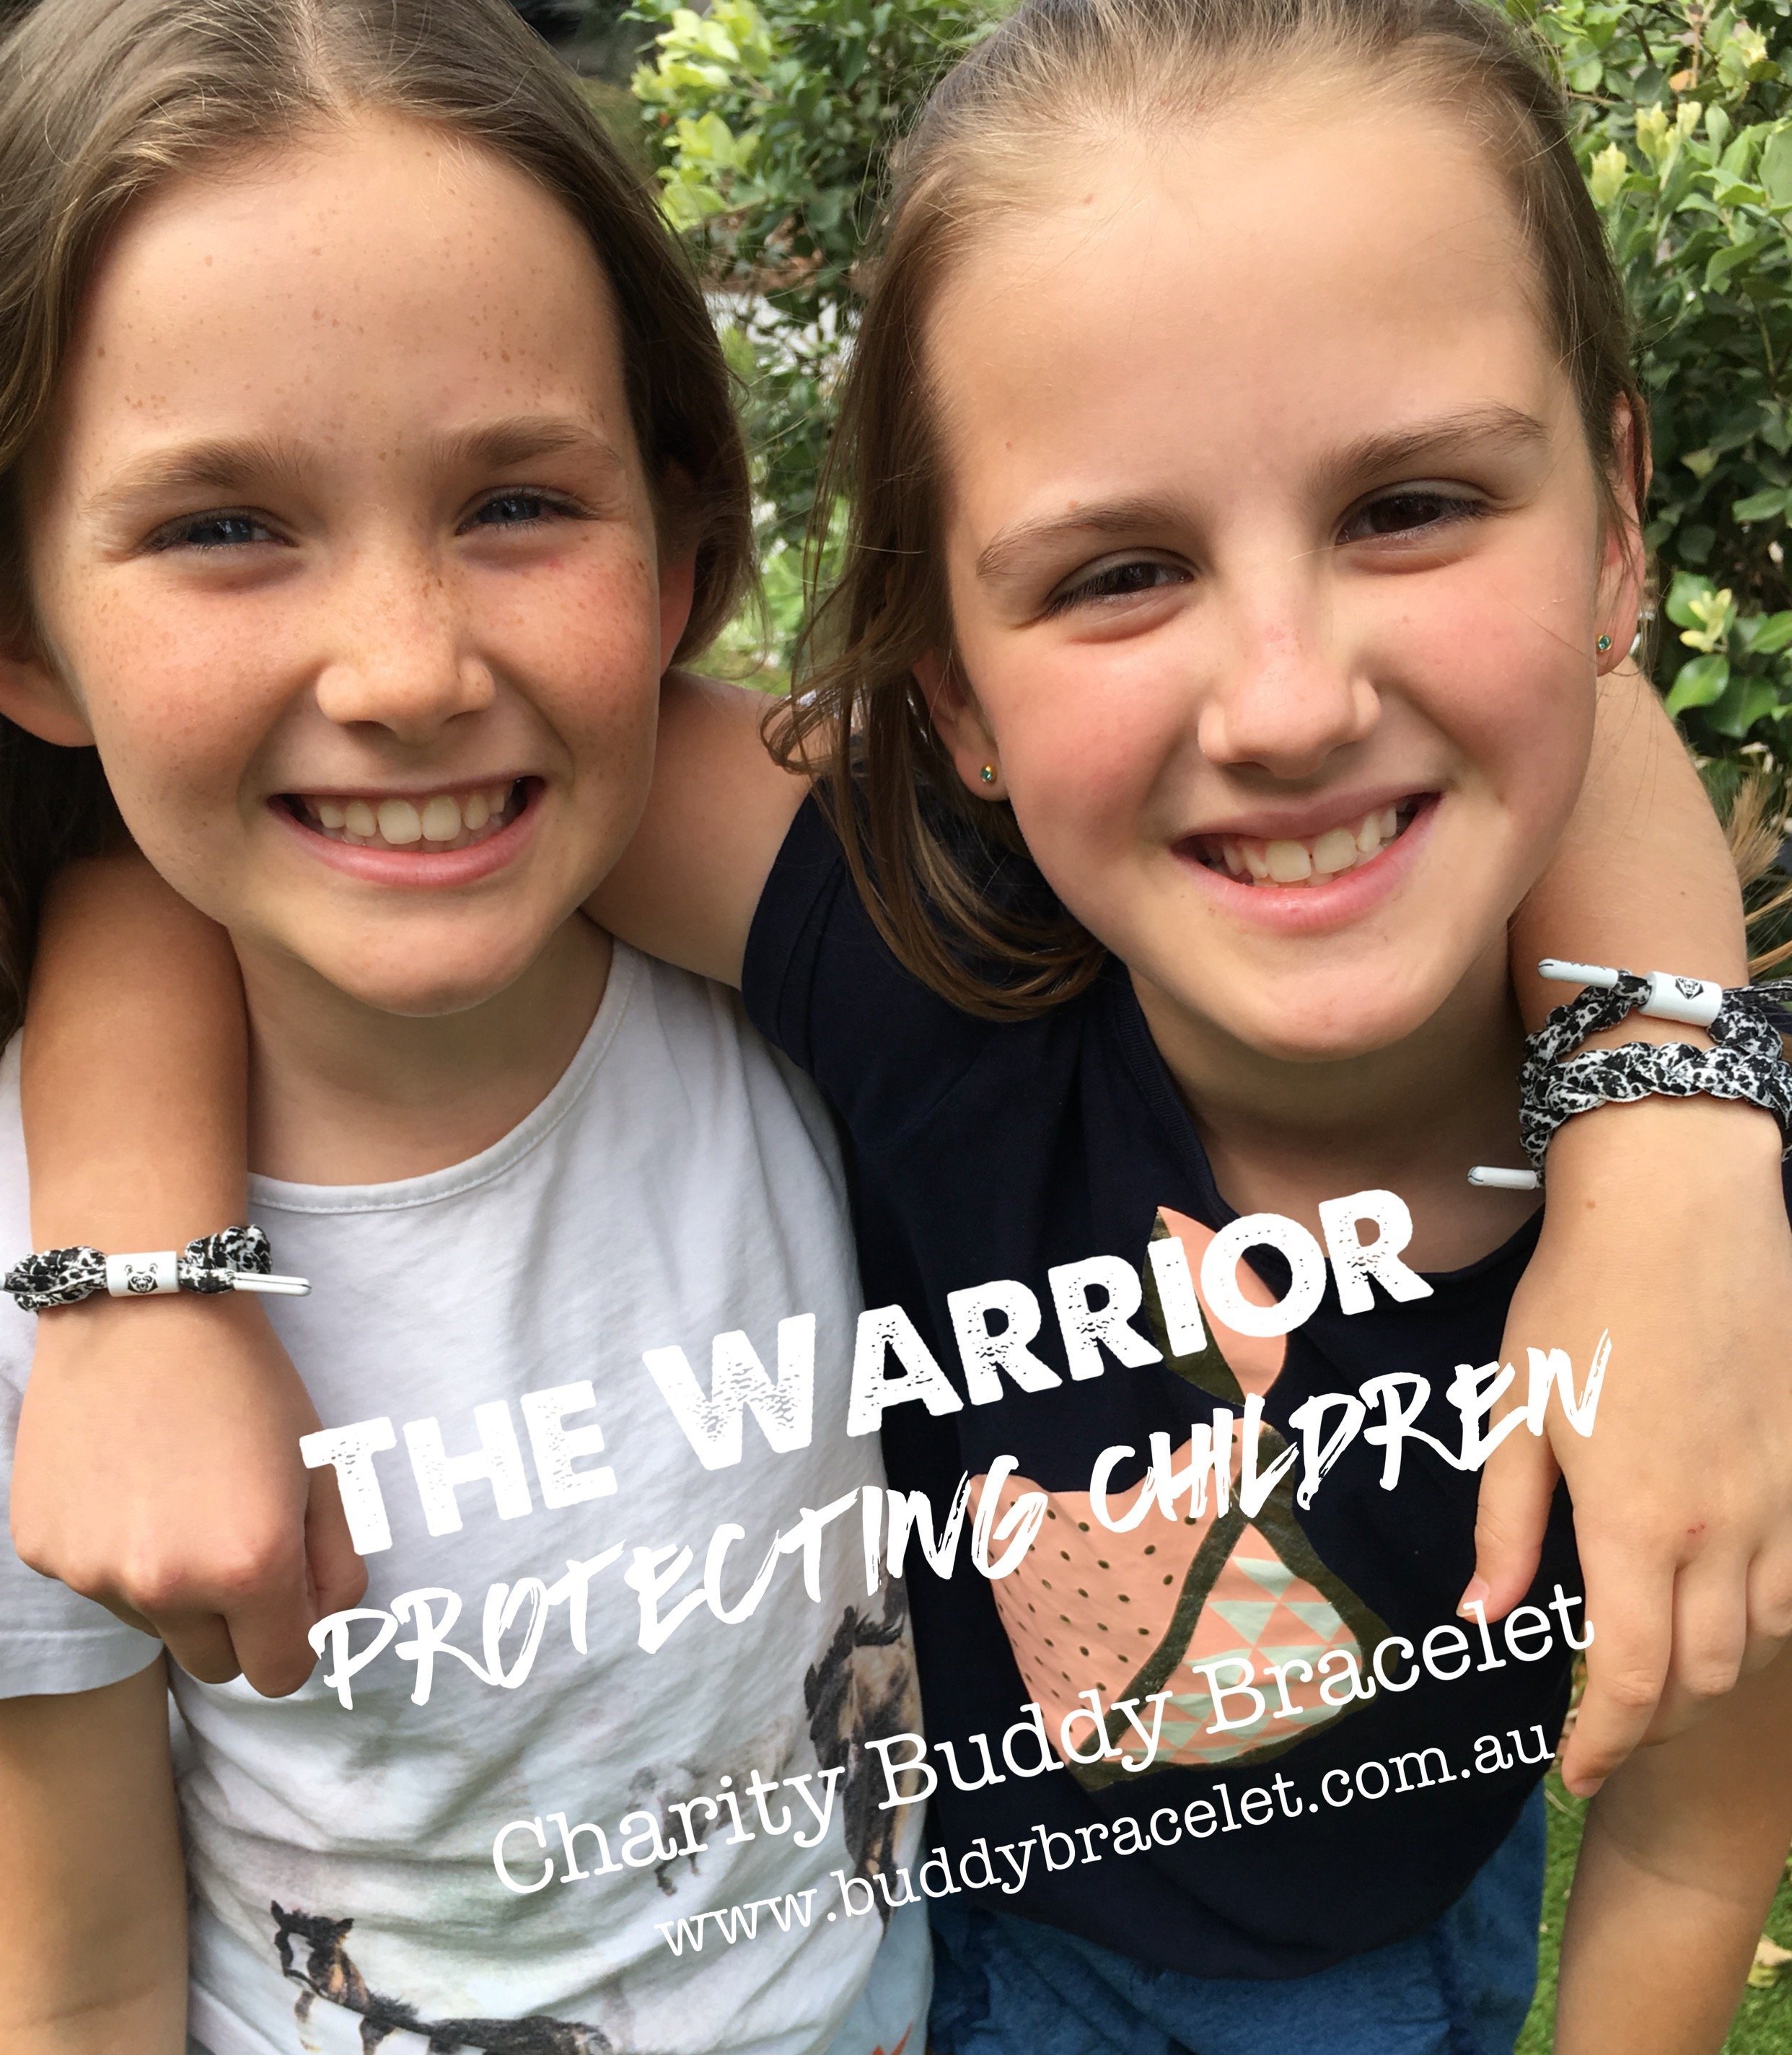 warrior-buddy-bracelet-h-b-the-change-angels-bravehearts.jpg